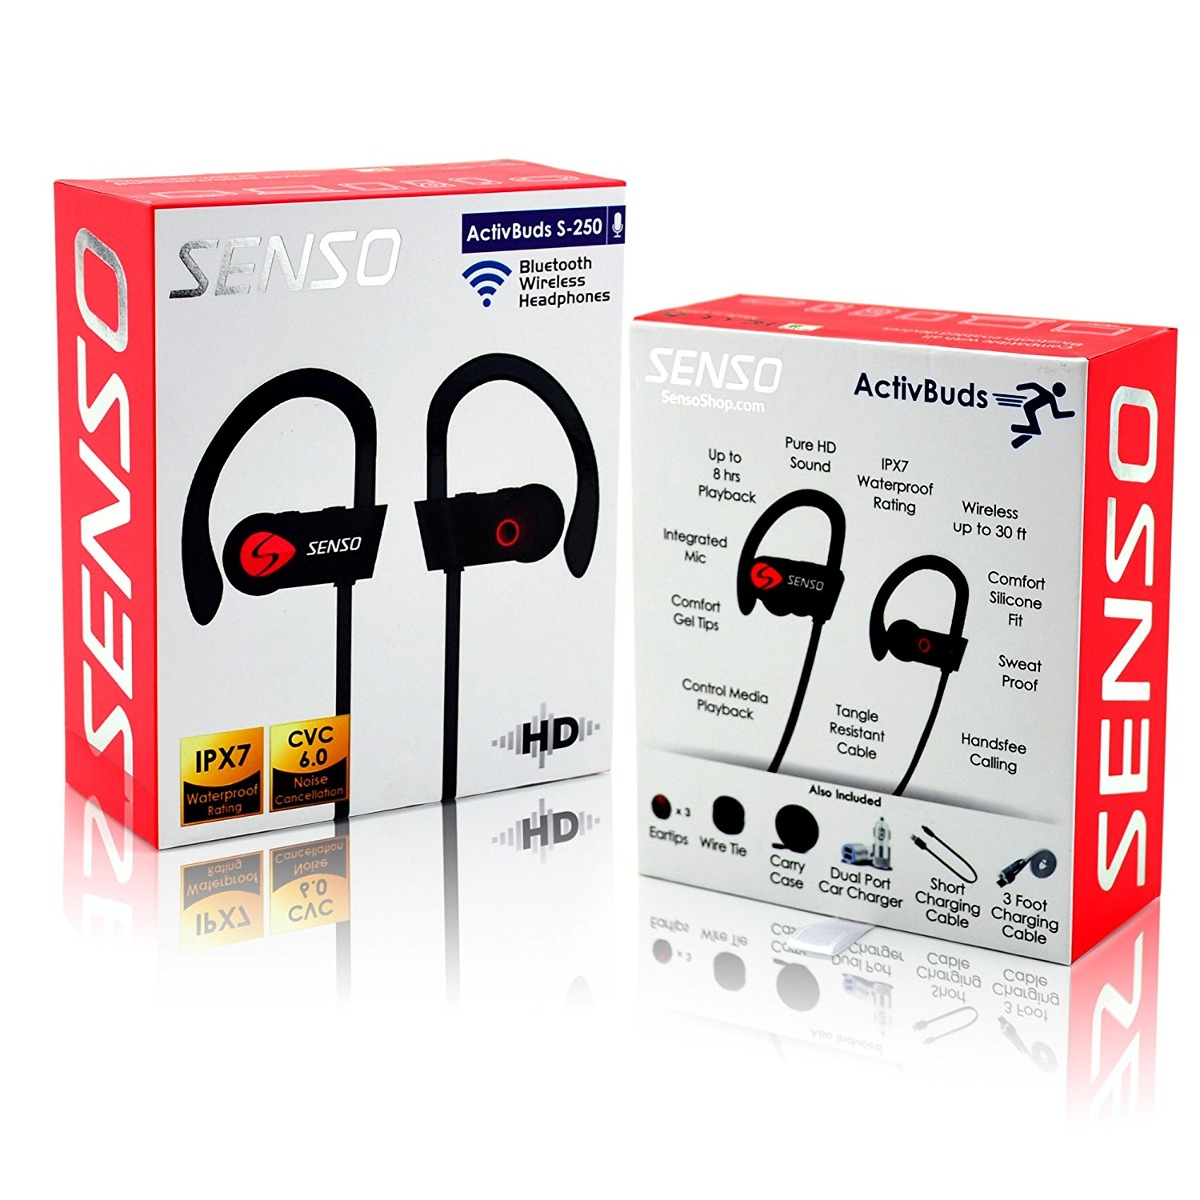 a8336f98cfa audifonos bluetooth senso con mic resist agua anti ruido. Cargando zoom.